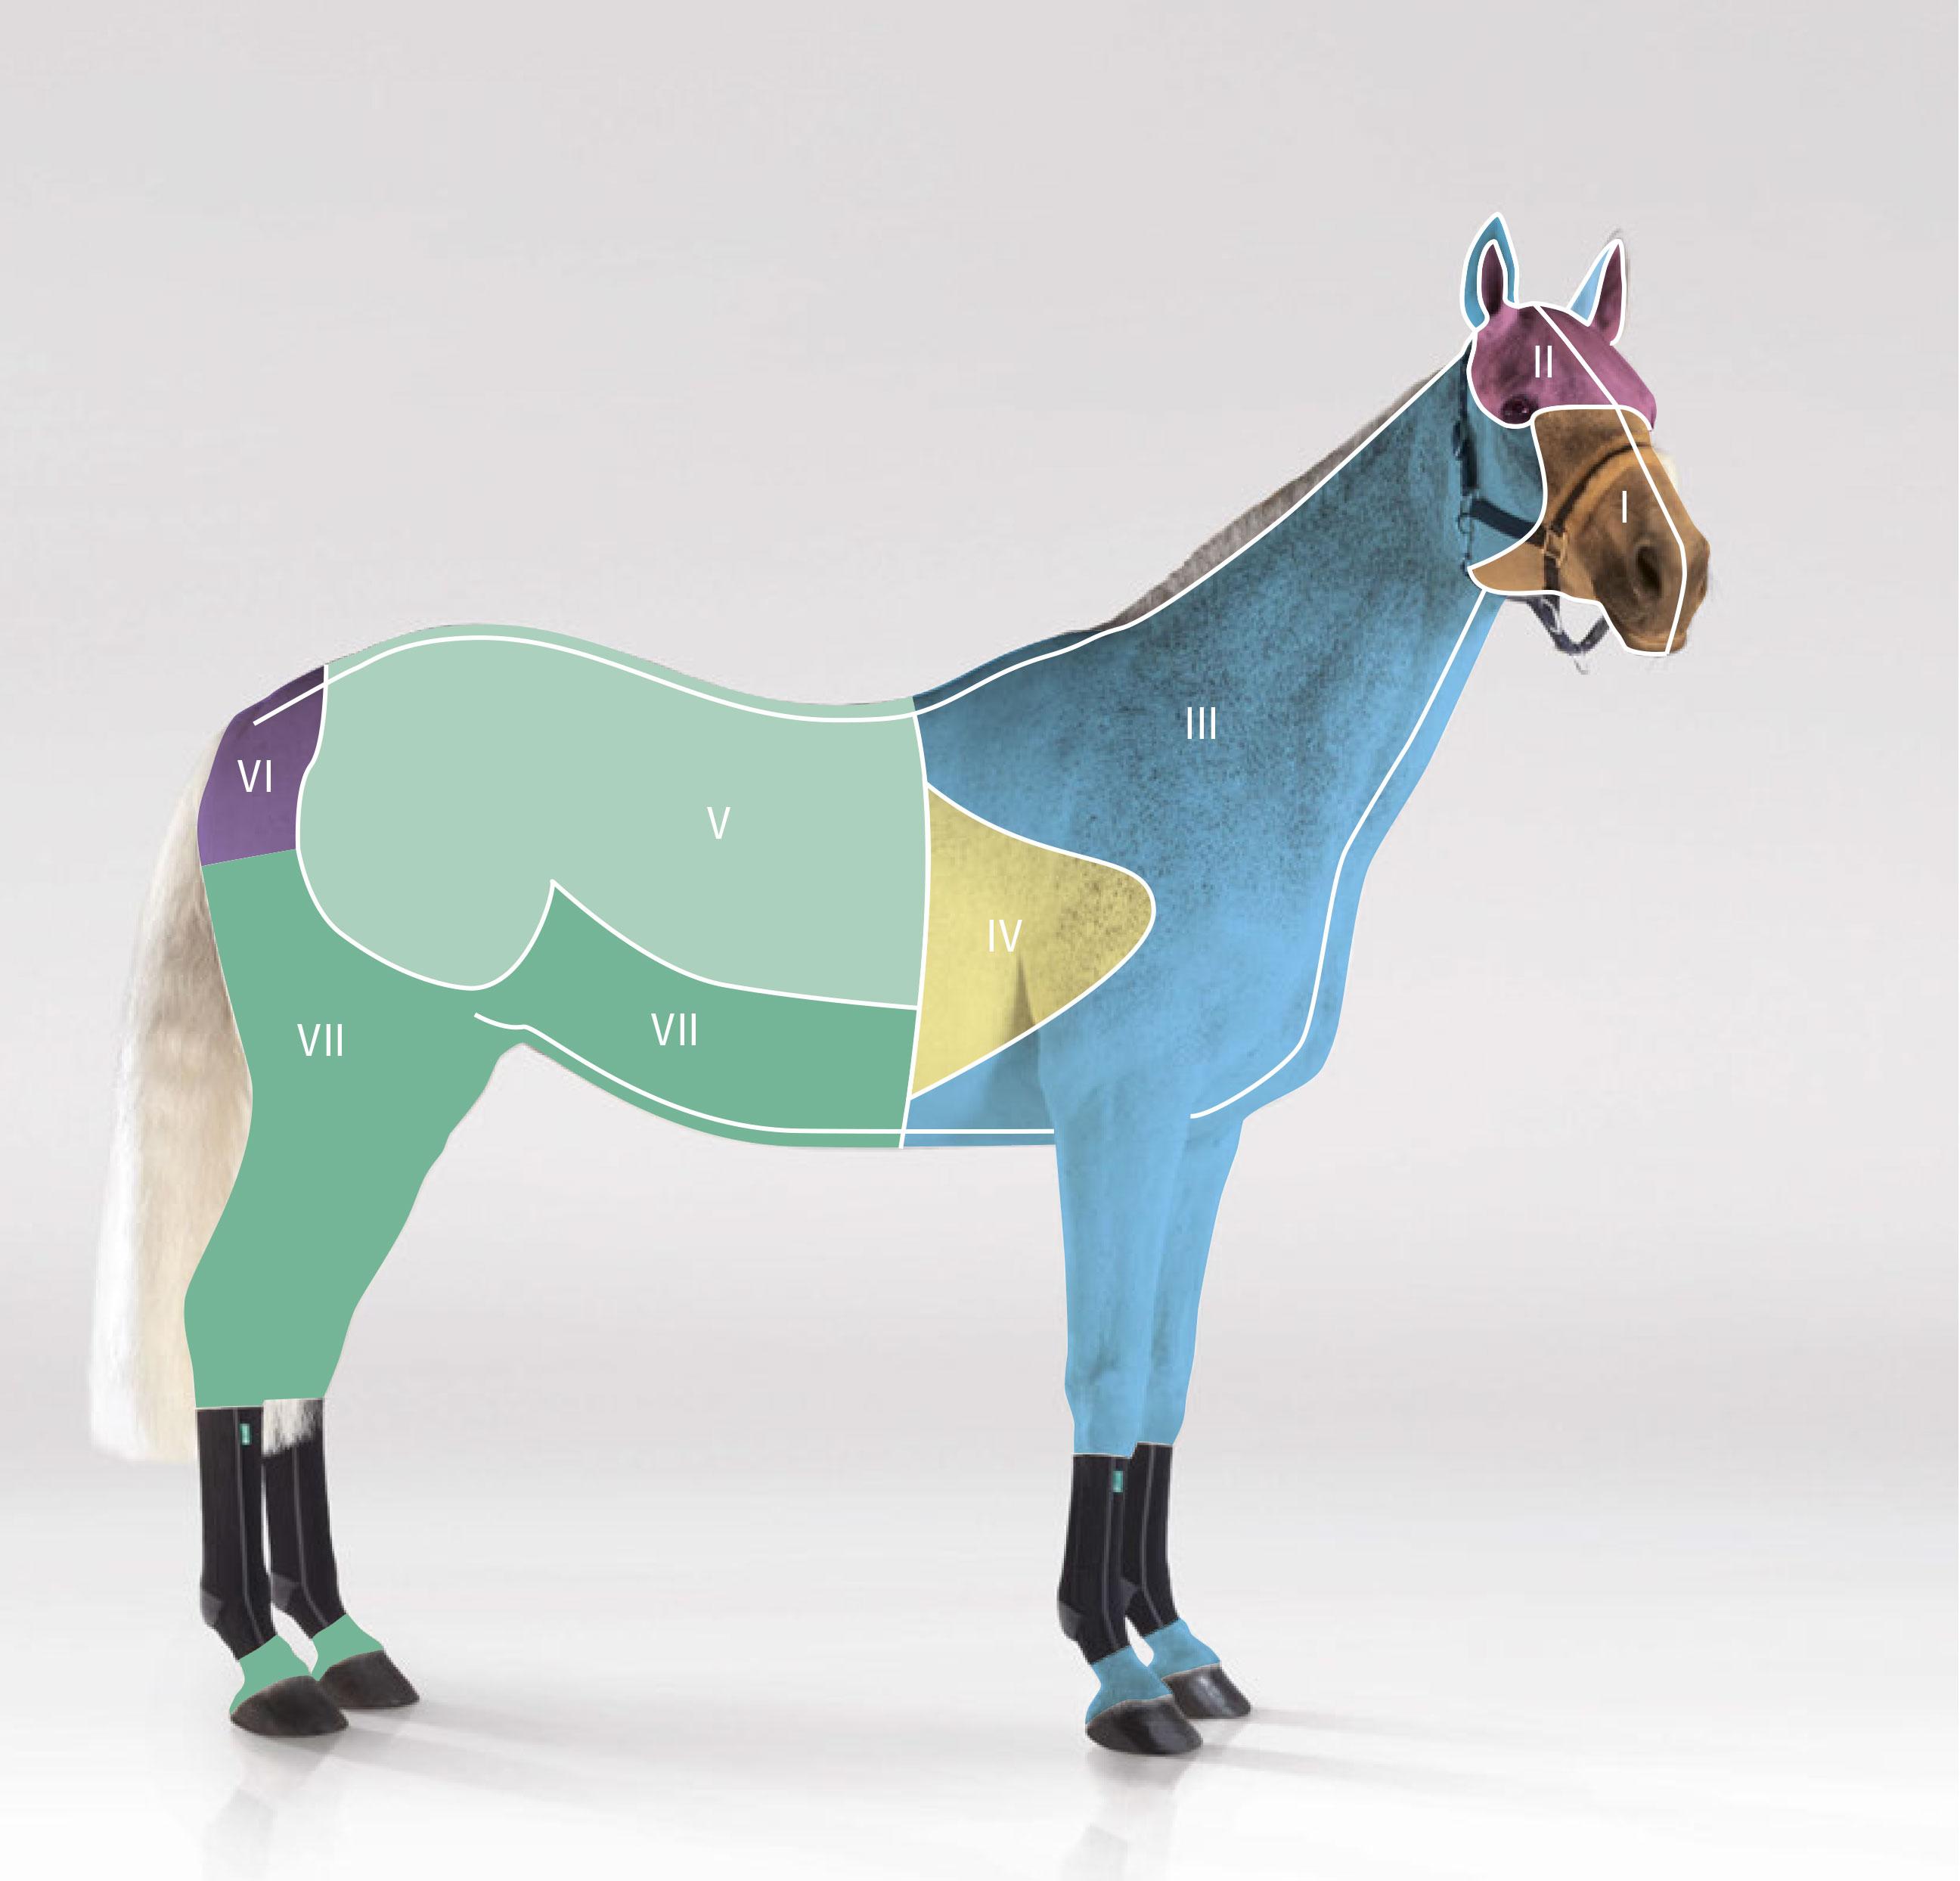 erkrankungen-des-lymphsystems-pferd